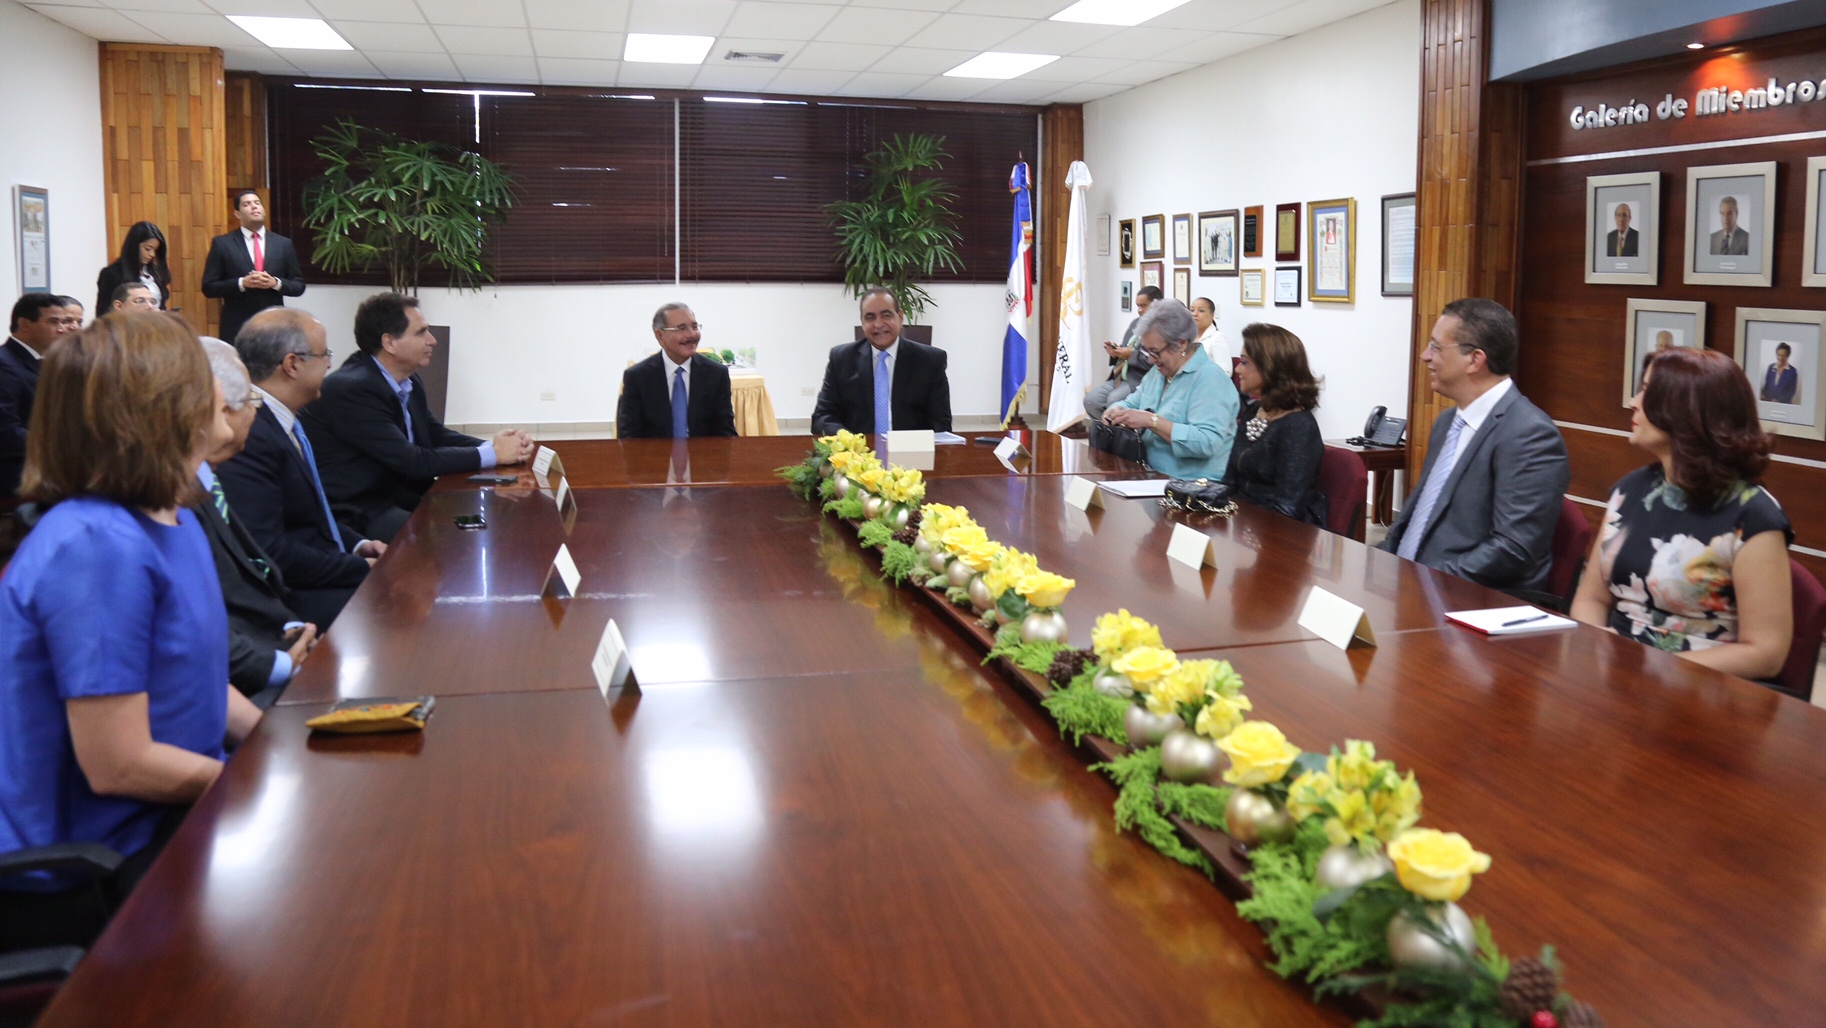 Presidente se reúne con patronato Plaza de la Salud e inauguran salas emergencia